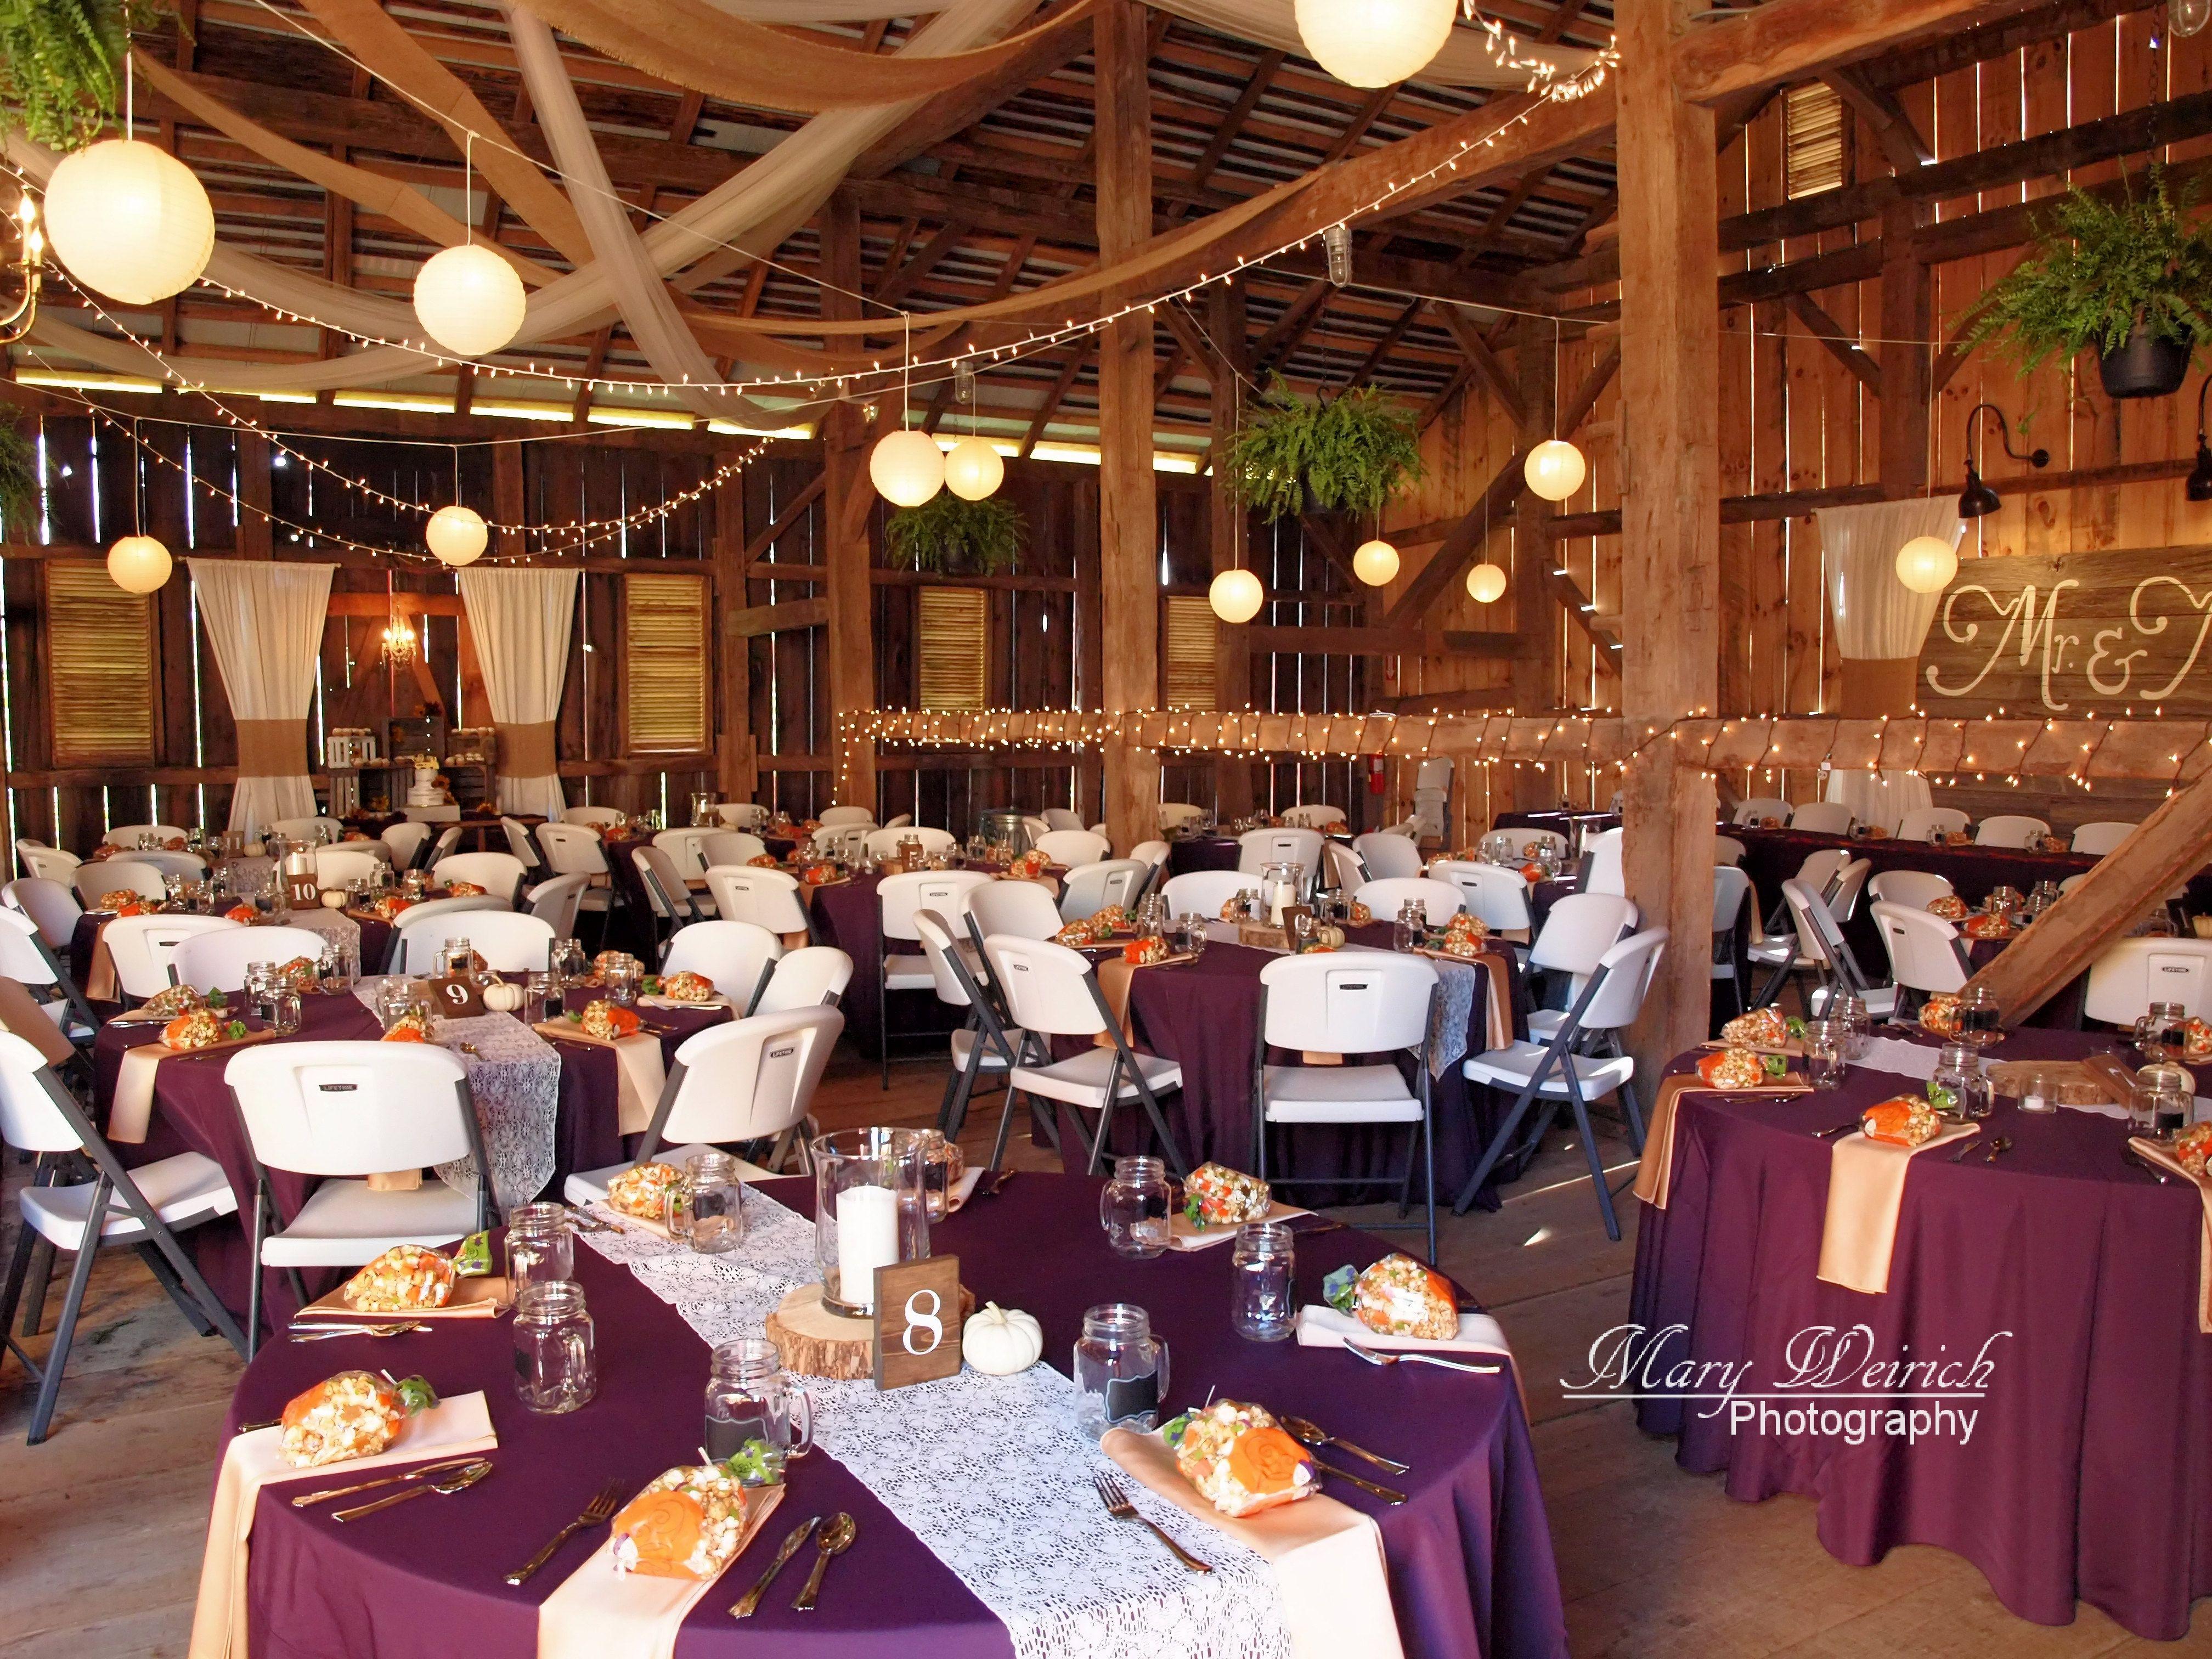 Barn Wedding Rustic Country Venue The Gish In Rittman Ohio Photography Pinterest Weddings Barns